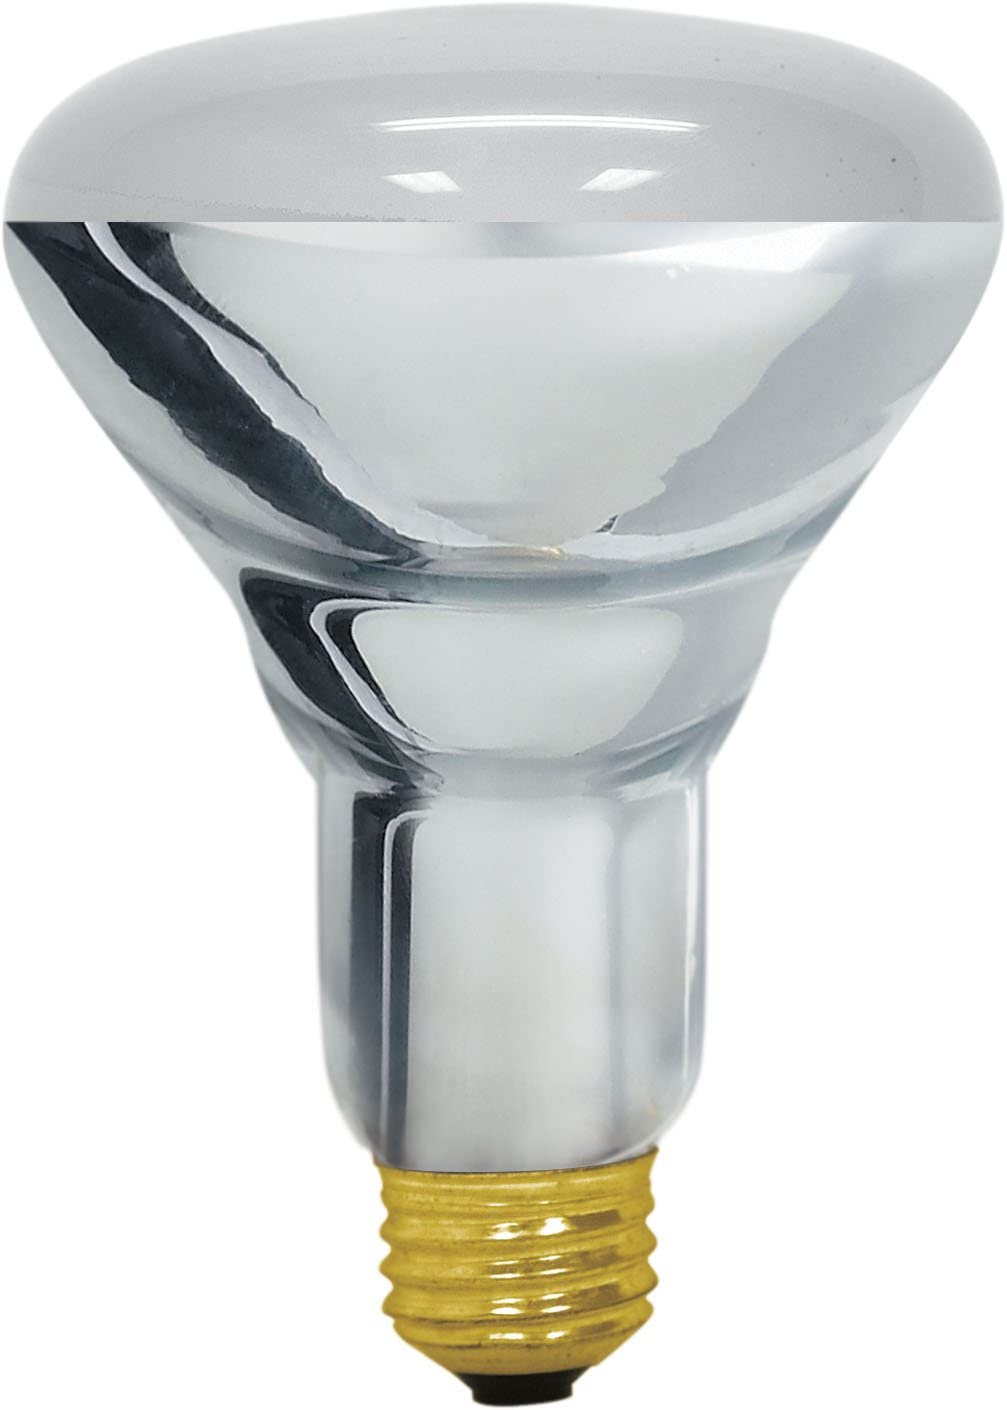 GE Lighting 74206 Energy-Efficient Halogen 45-Watt (65-watt replacement) 640-Lumen R30 Floodlight Bulb with Medium Base, 1-Pack